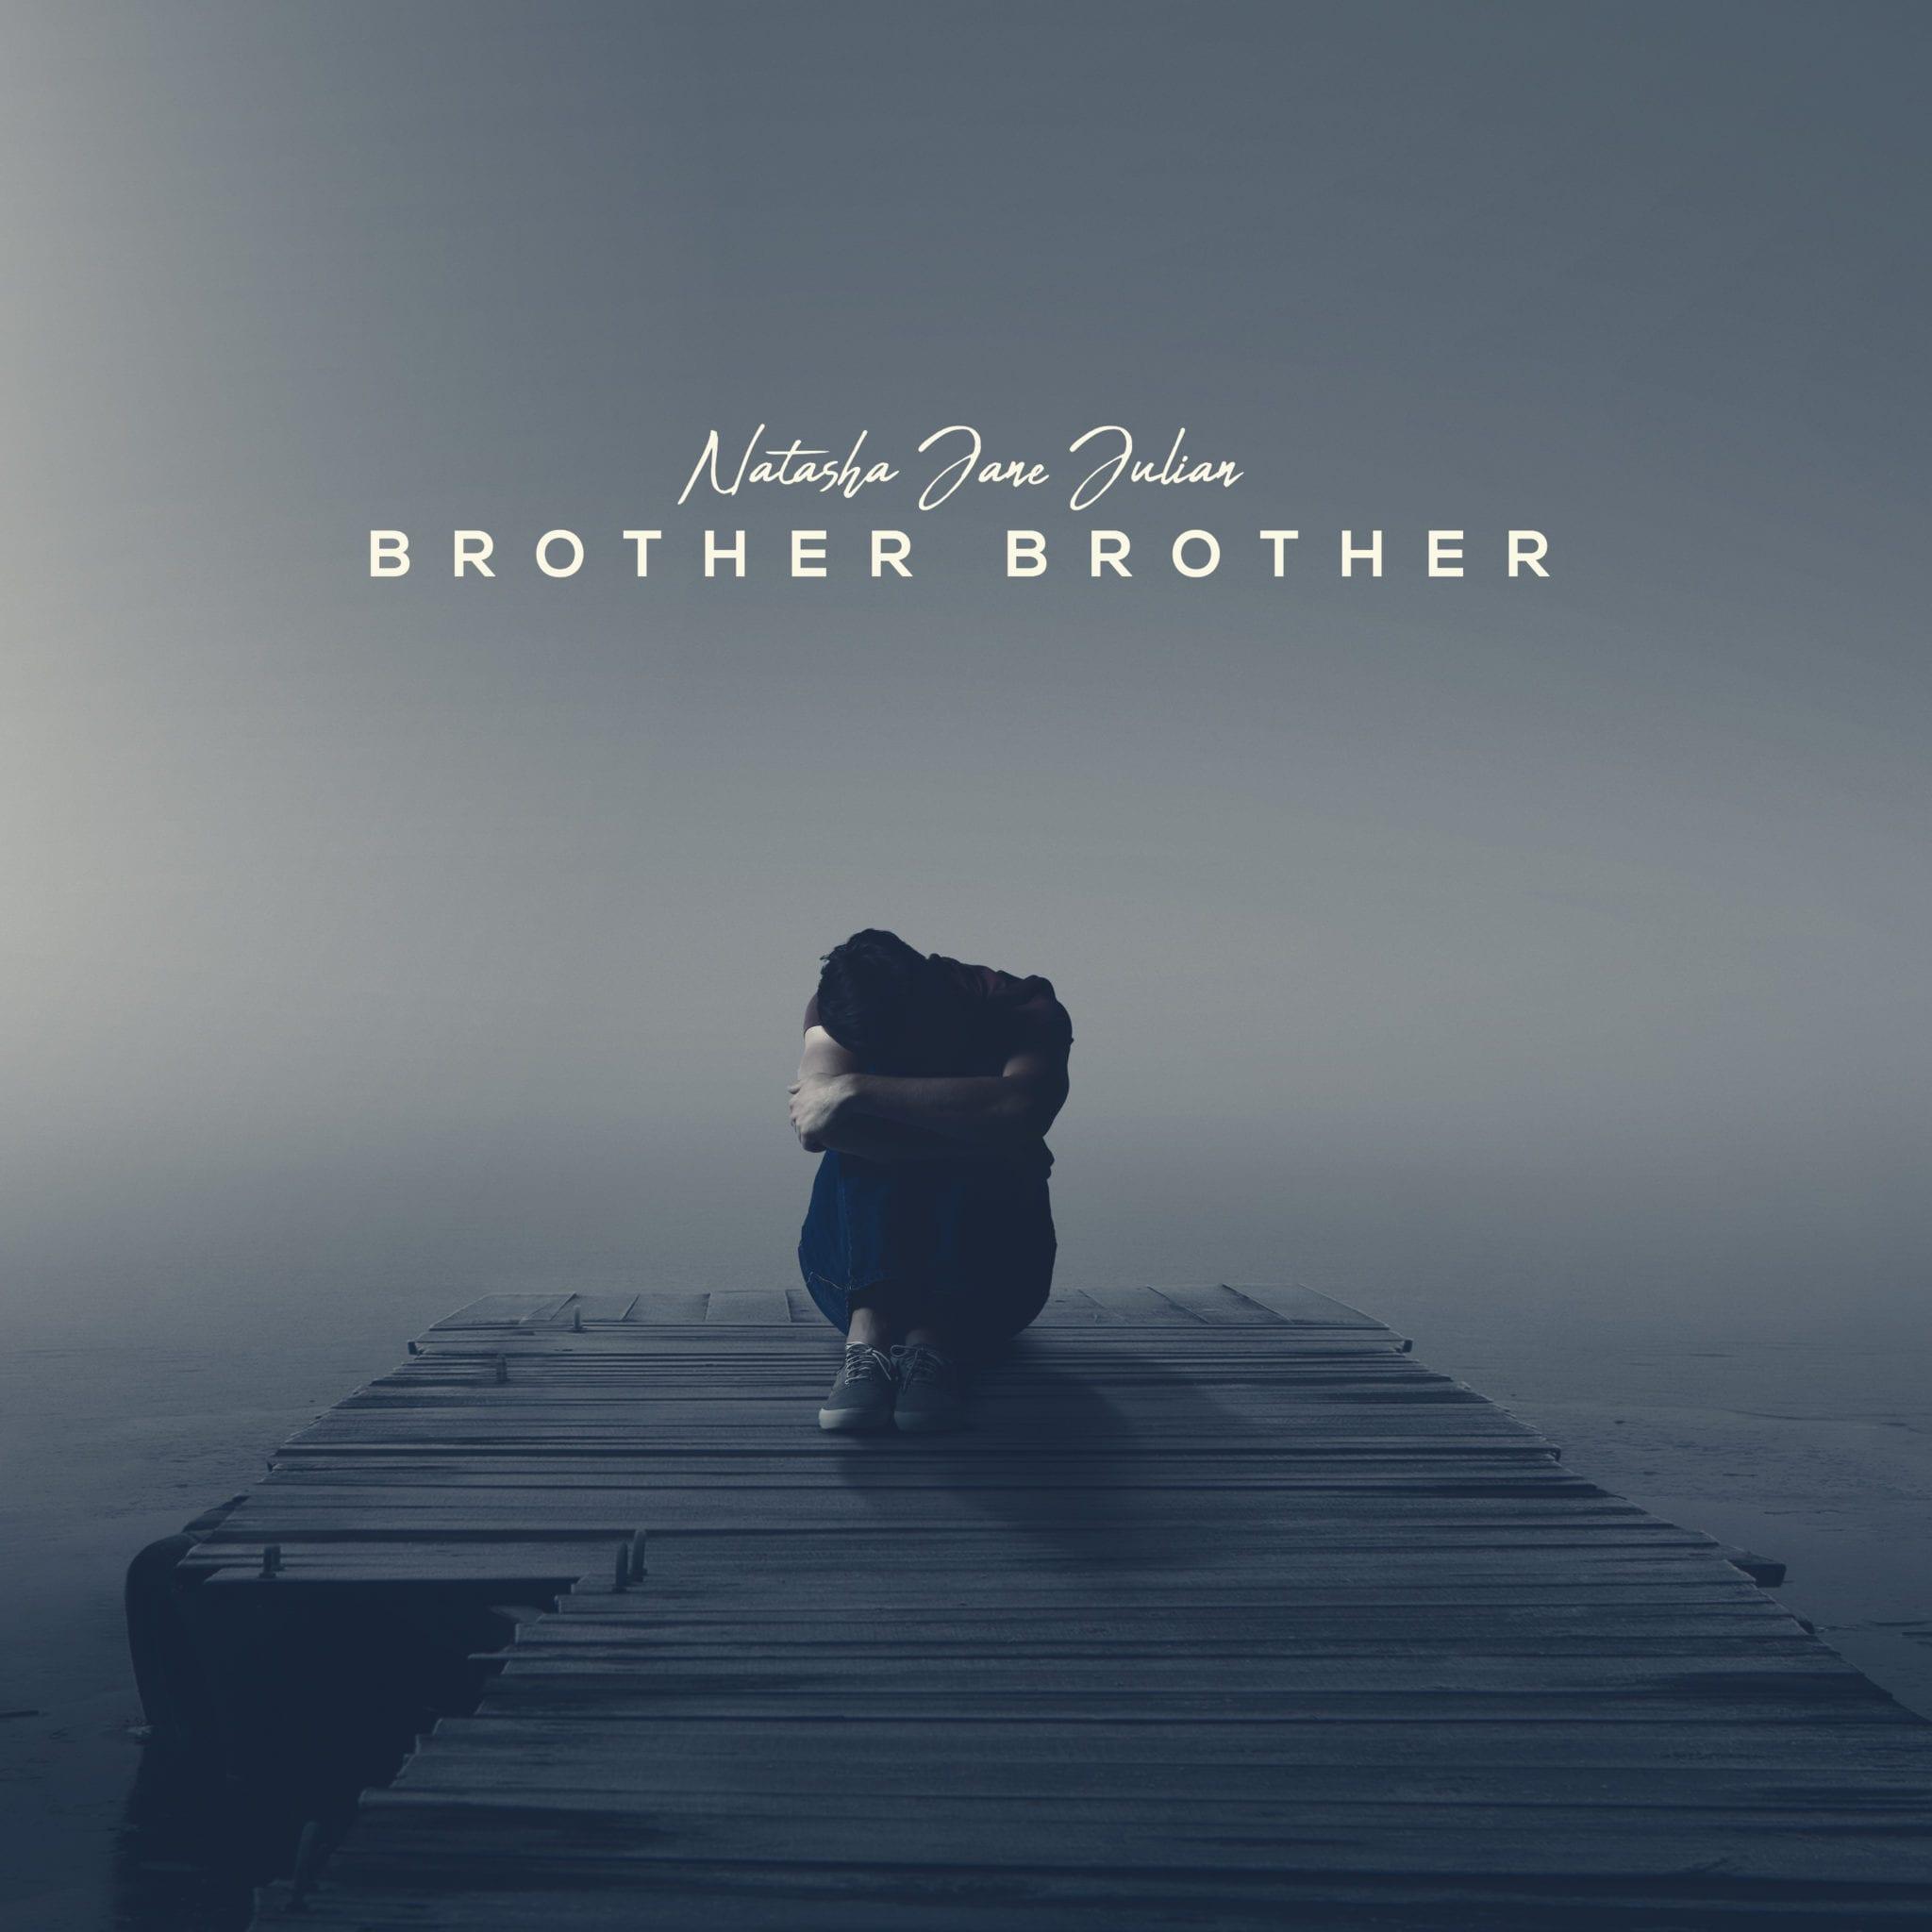 Natasha-Jane-Julian-(Brother Brother)---Cover-2